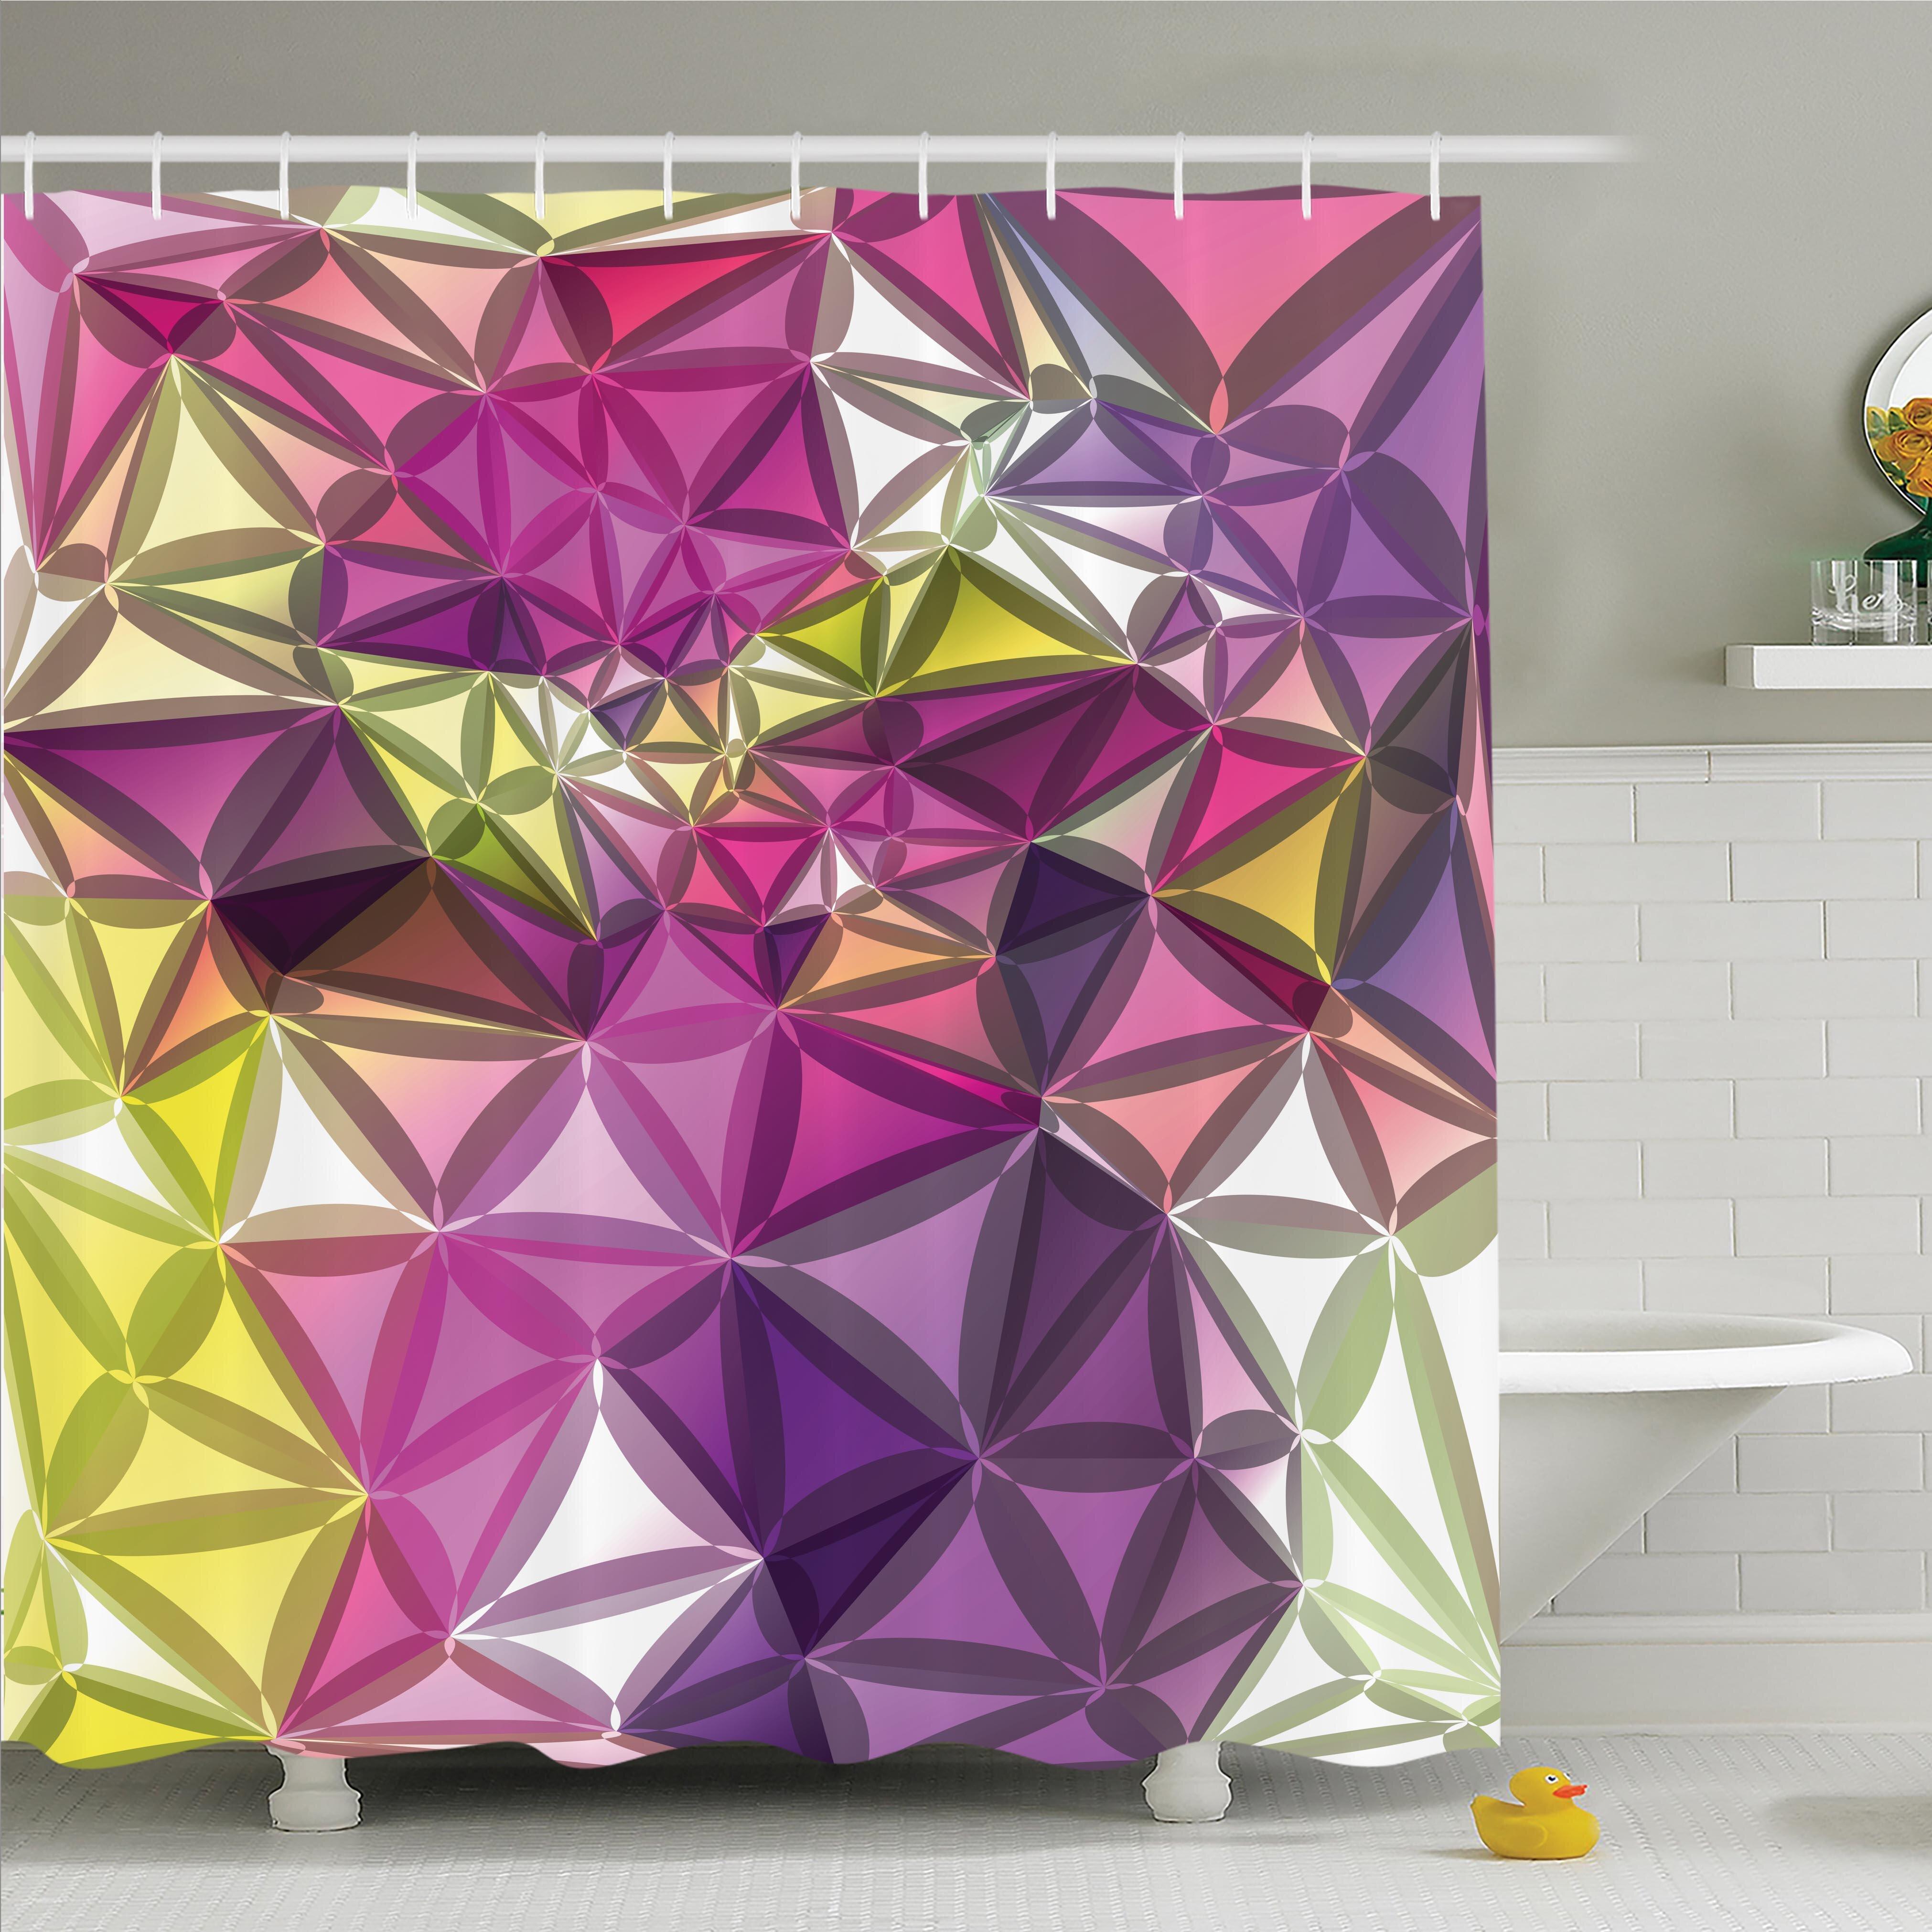 Latitude Run Nathanael Geometrical Shiny Shower Curtain Set